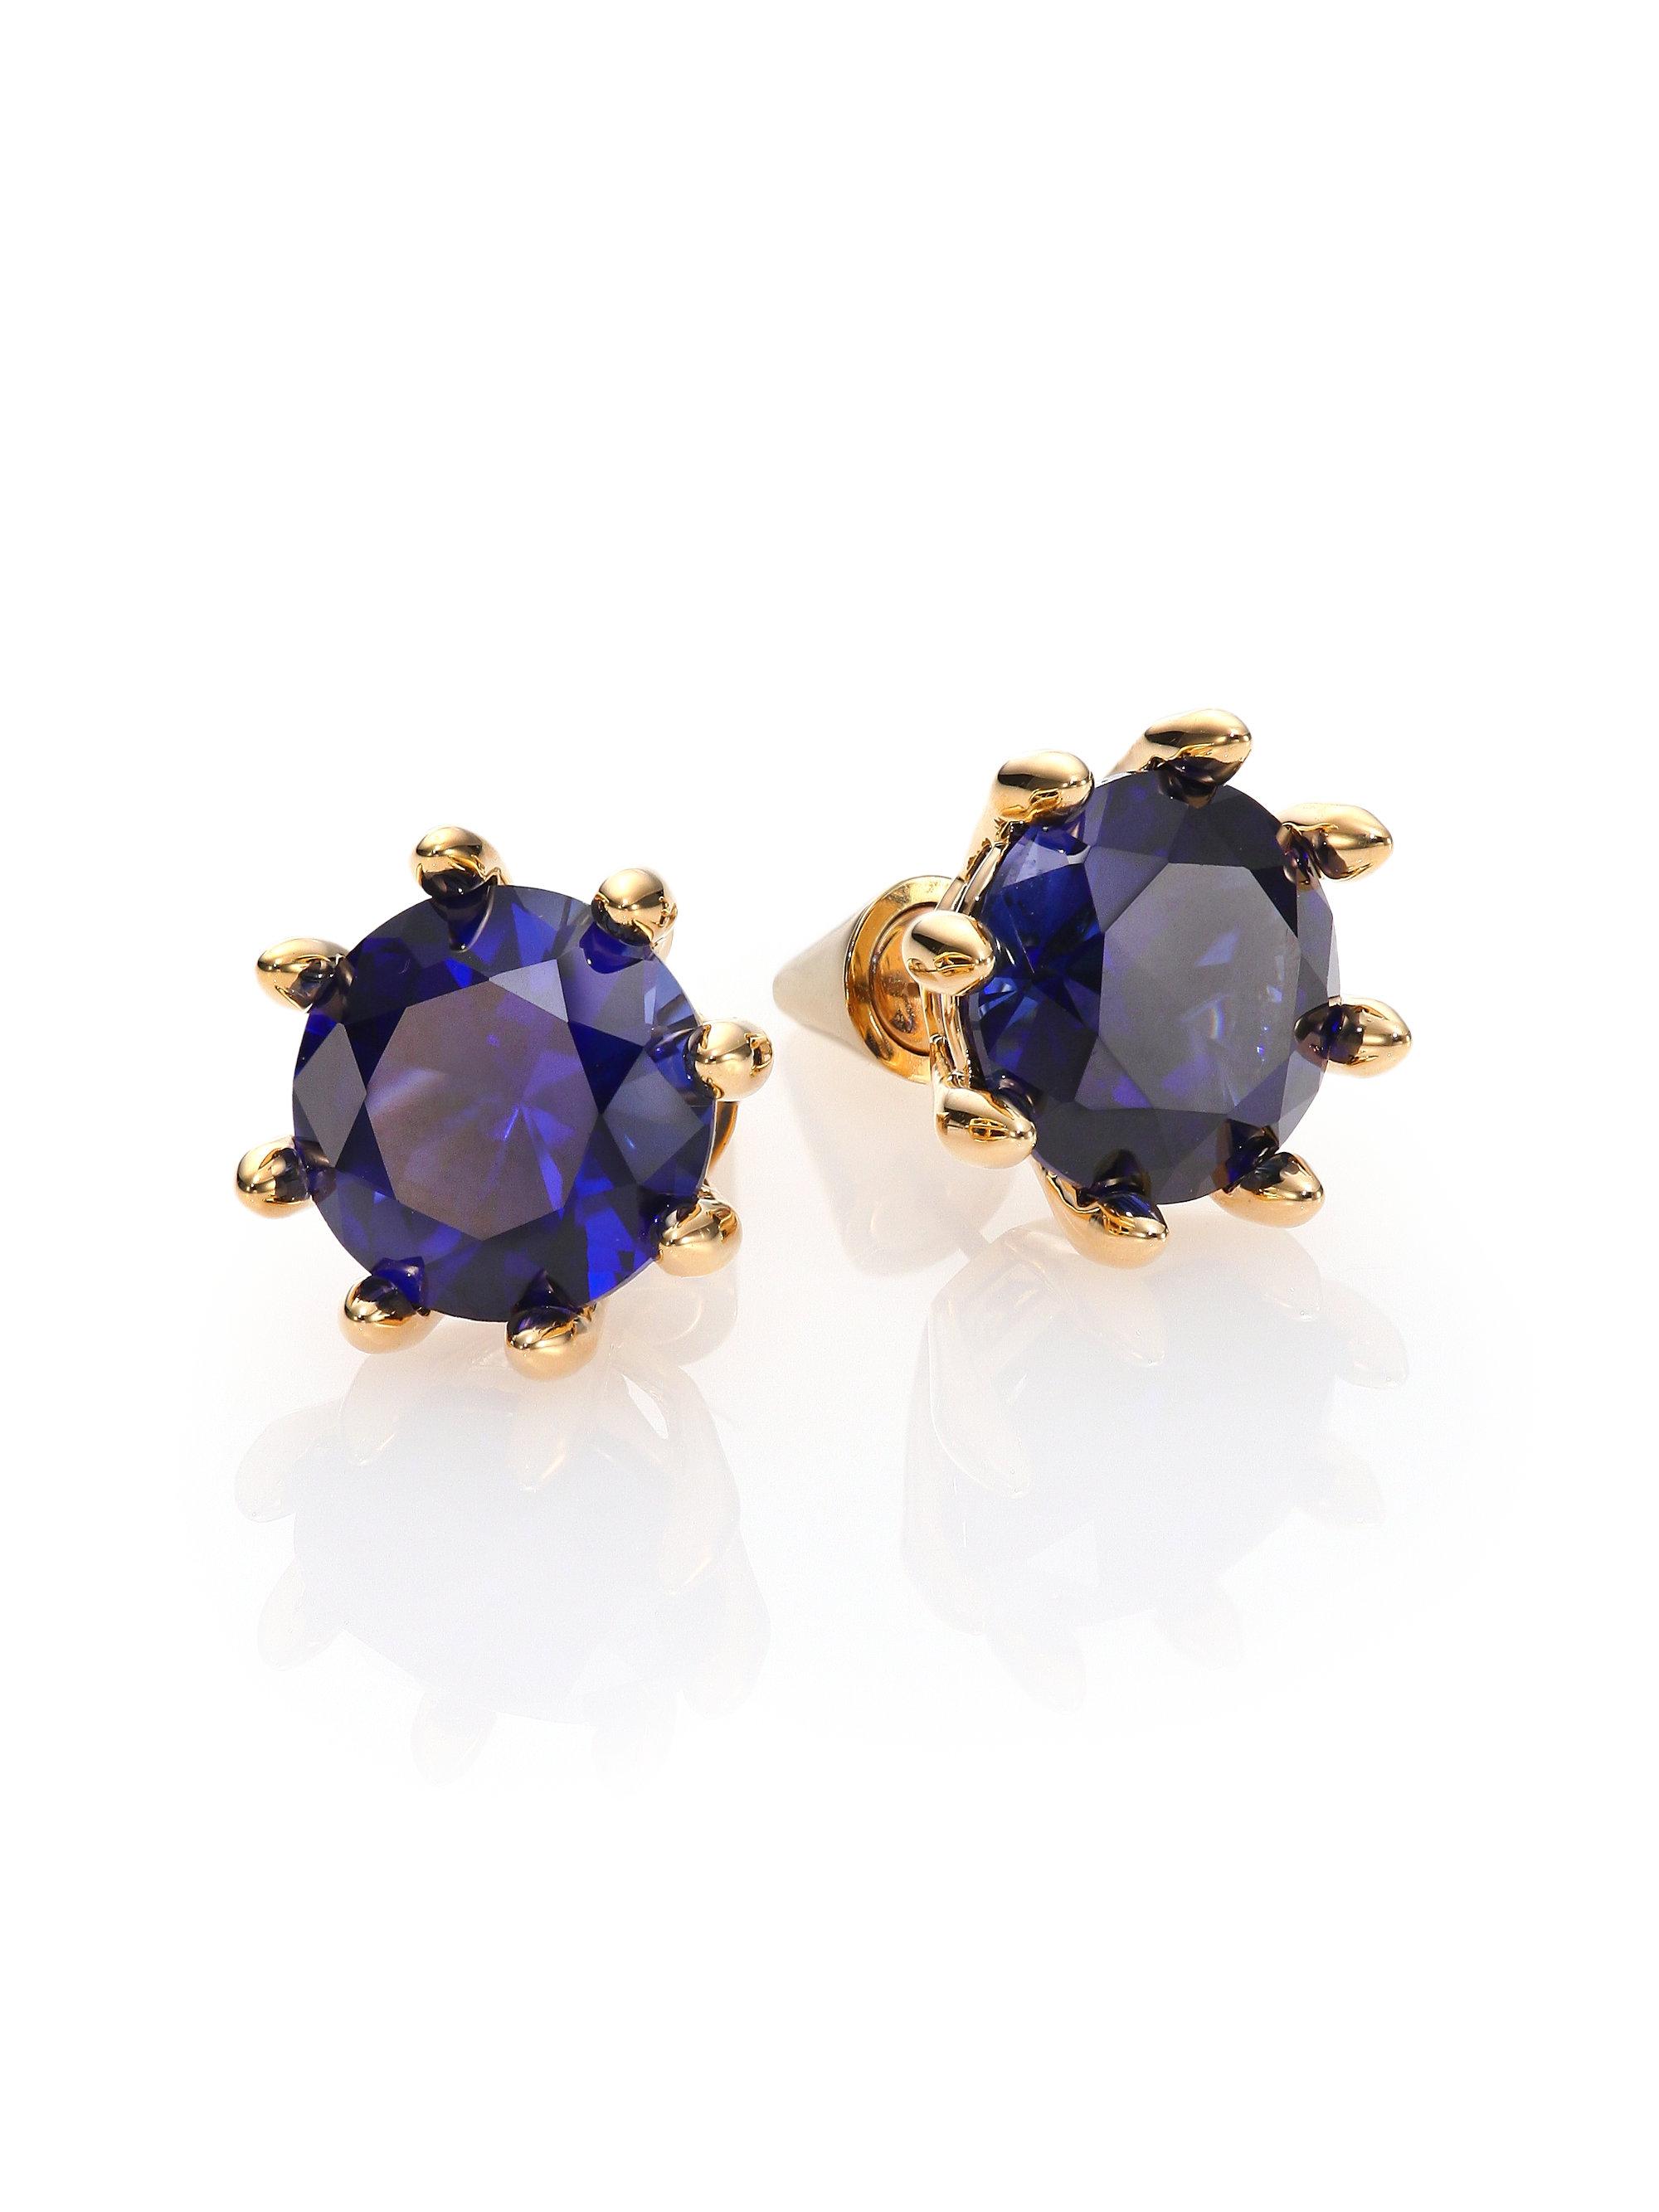 Eddie Borgo Circle Estate Cubic Zirconia Earrings In